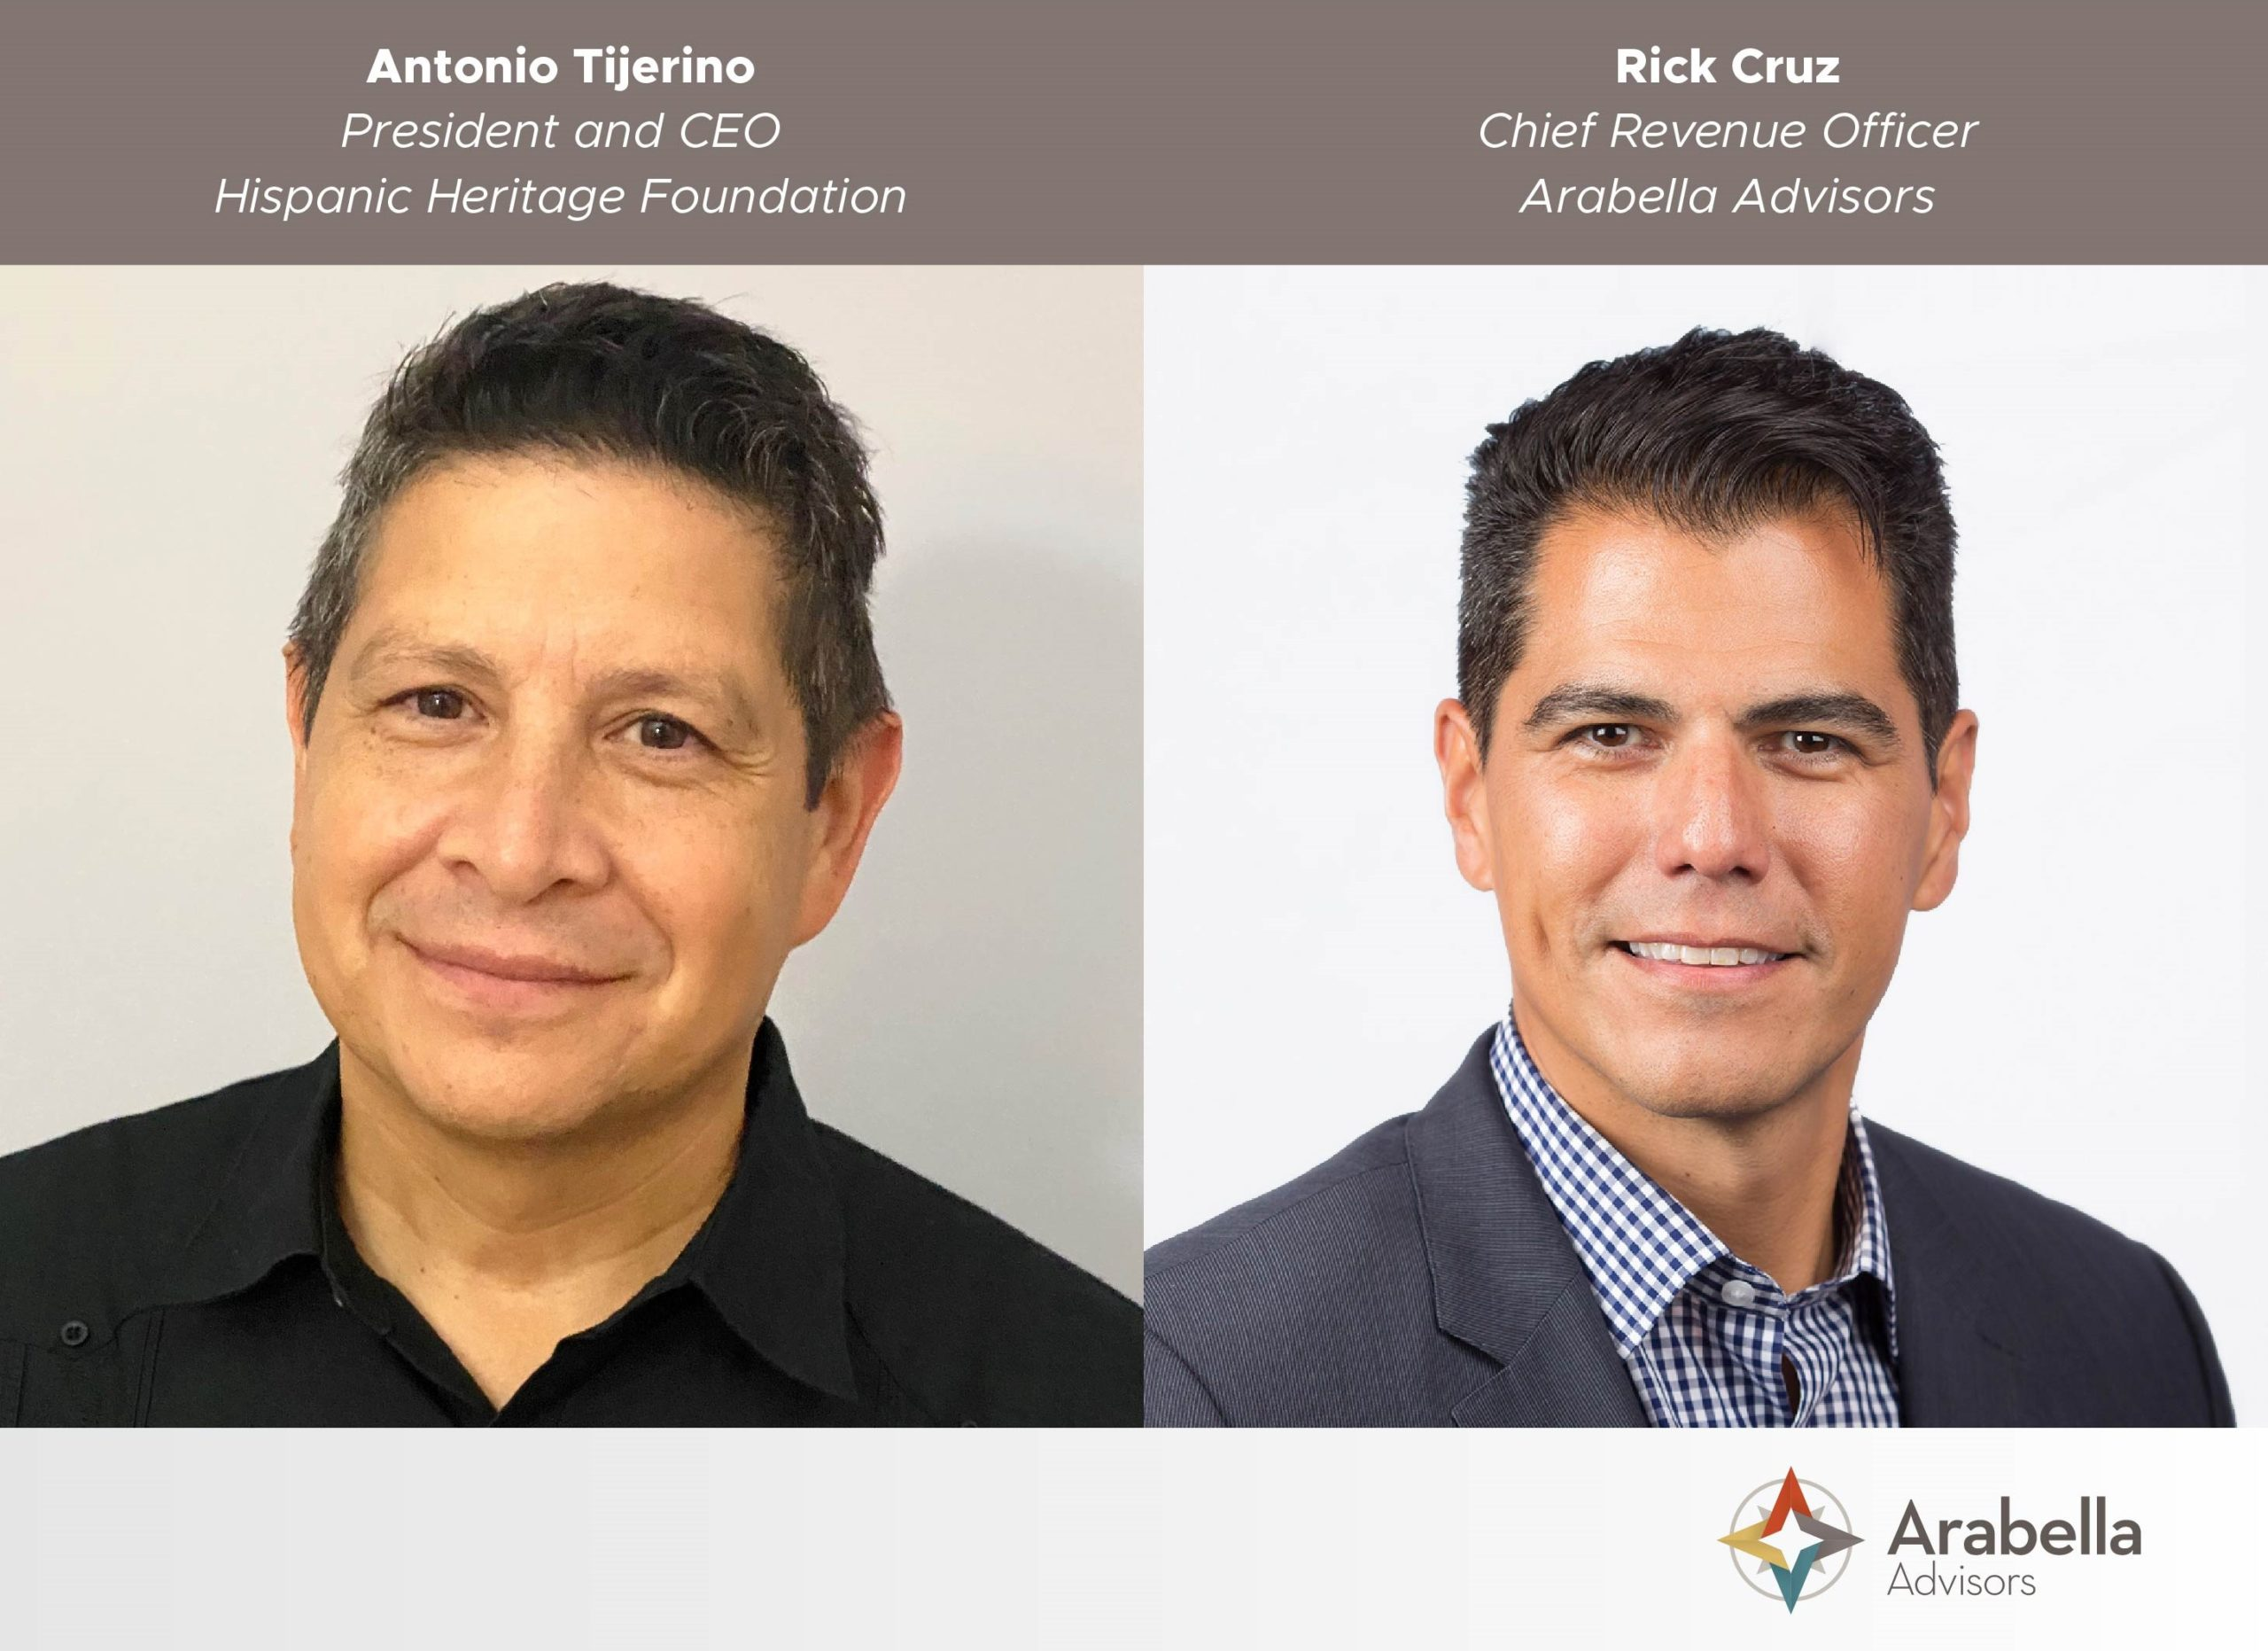 Antonio Tijerino and the Hispanic Heritage Foundation